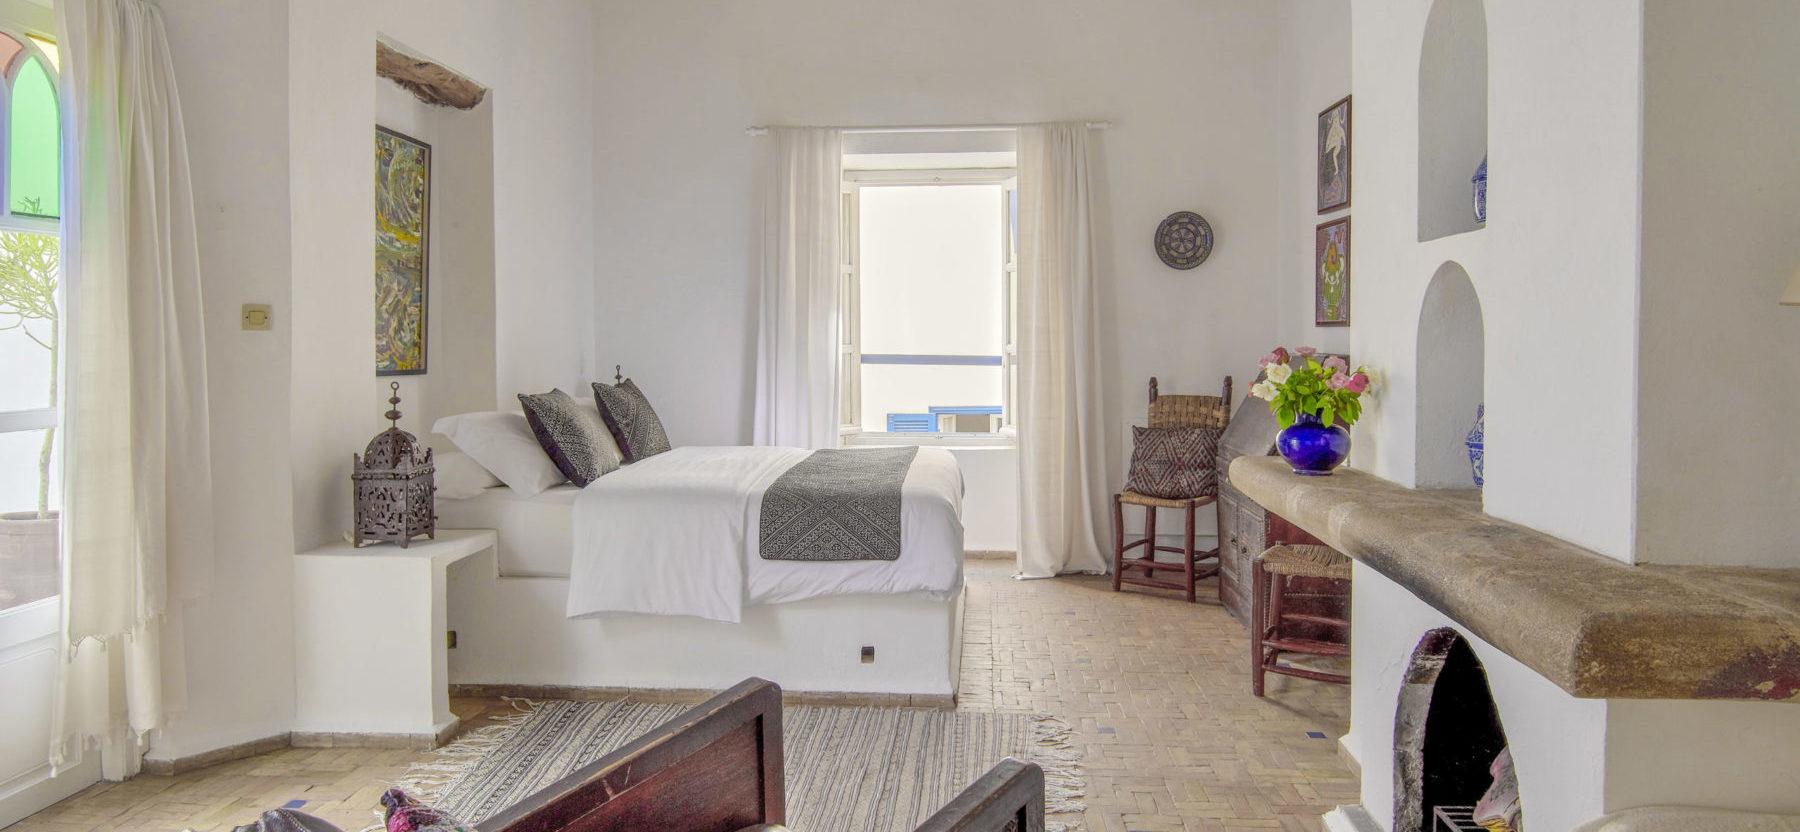 Rooms suites Riad hotel Villa Maroc Essaouira